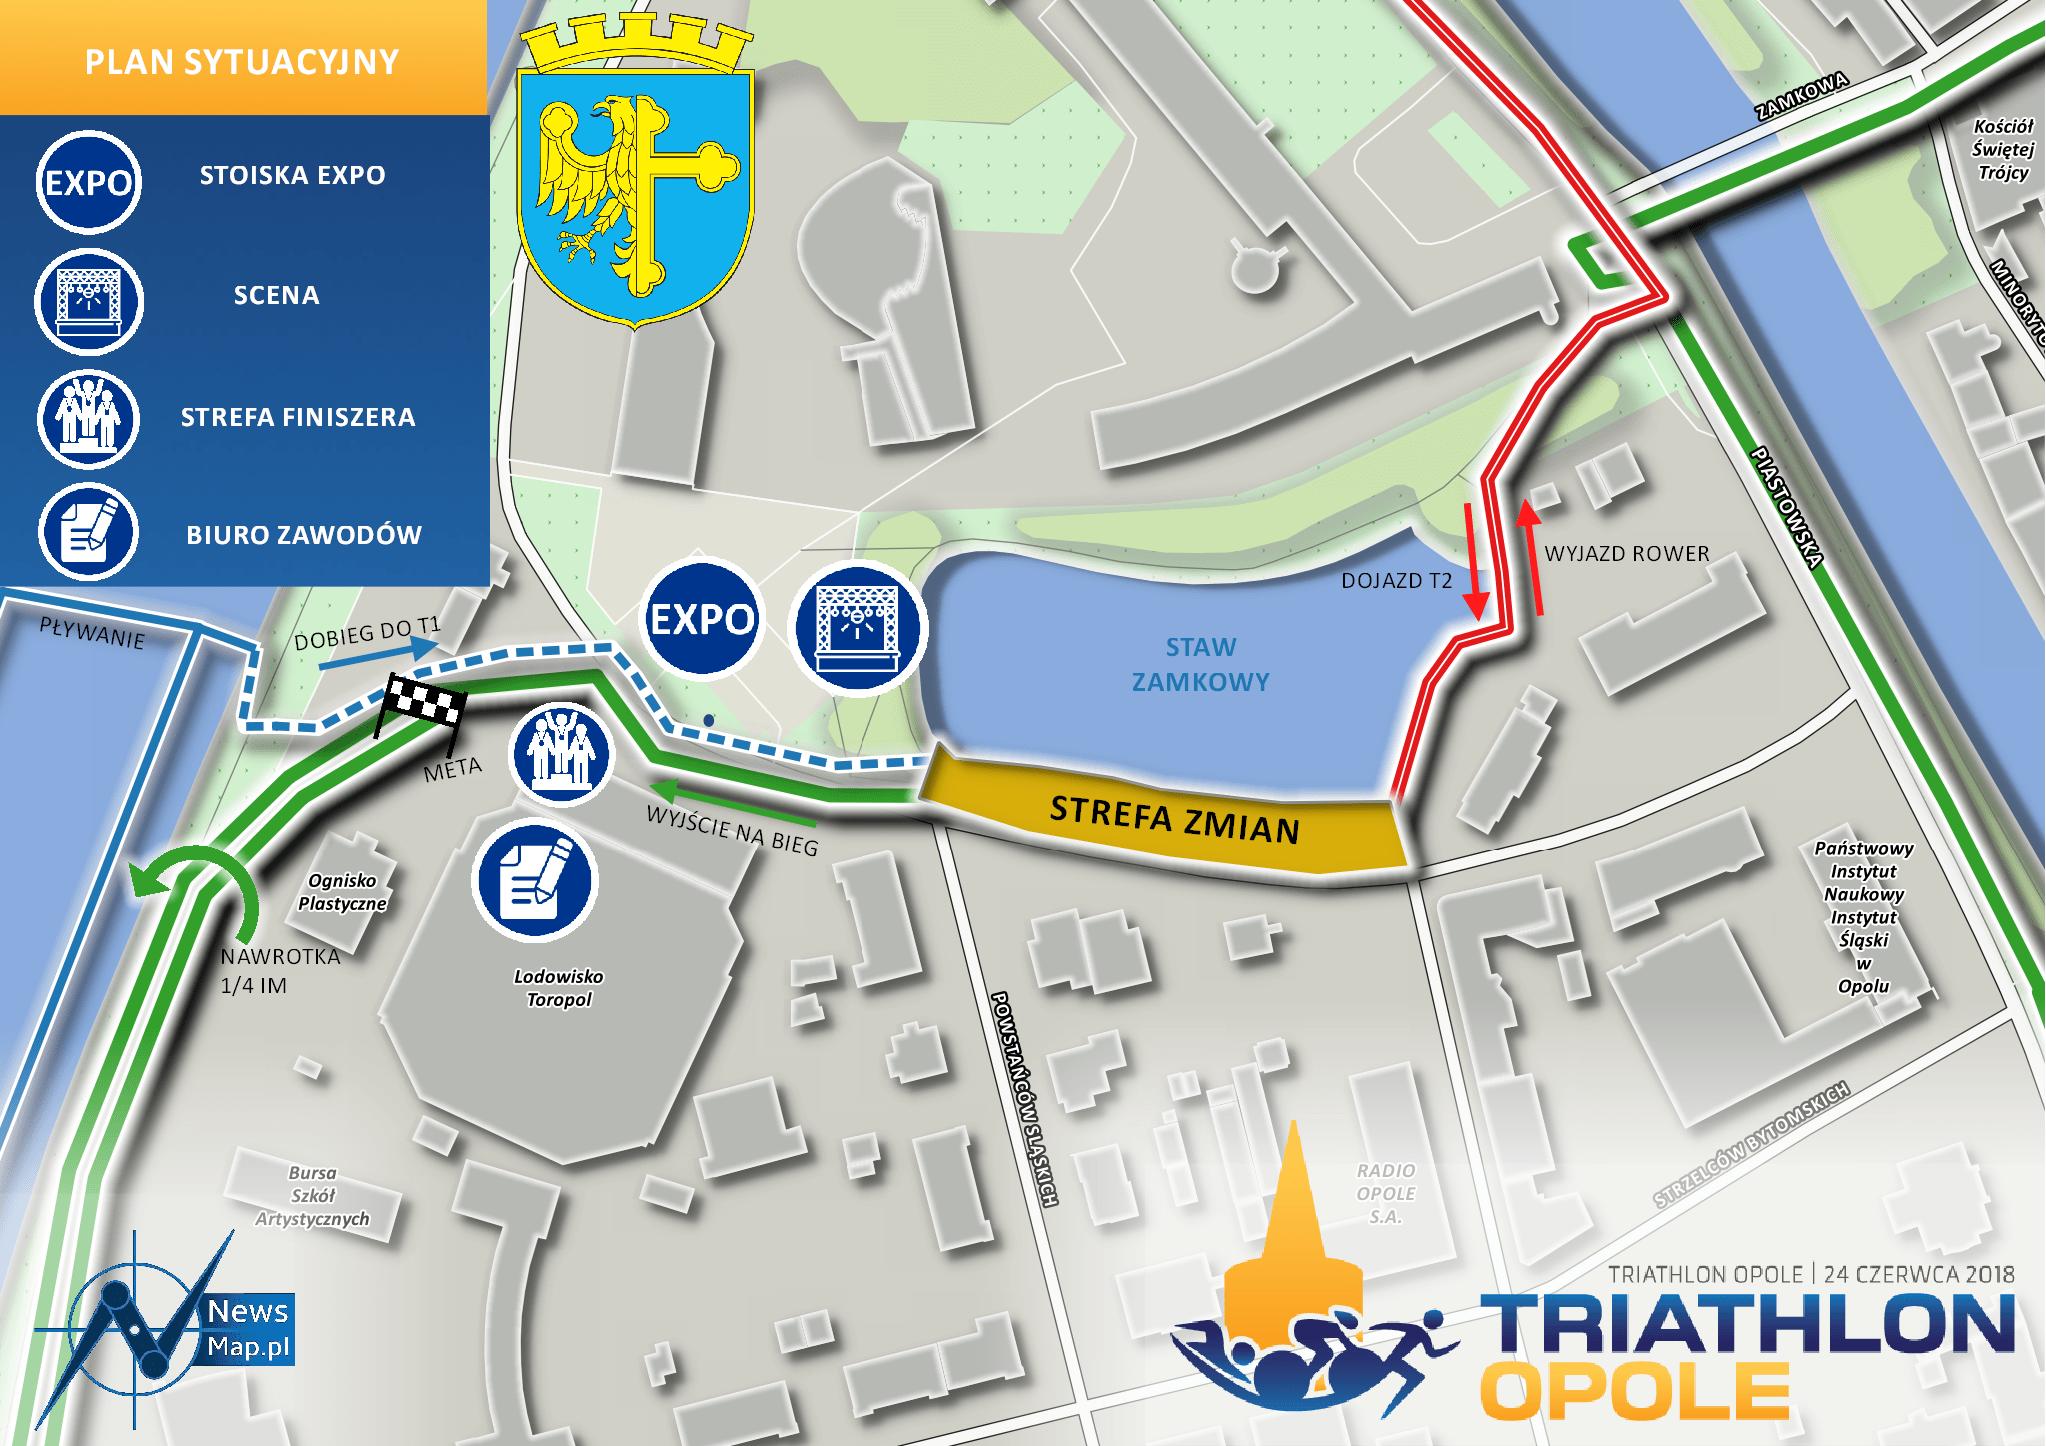 Triathlon Opole 2018 - plan sytuacyjny